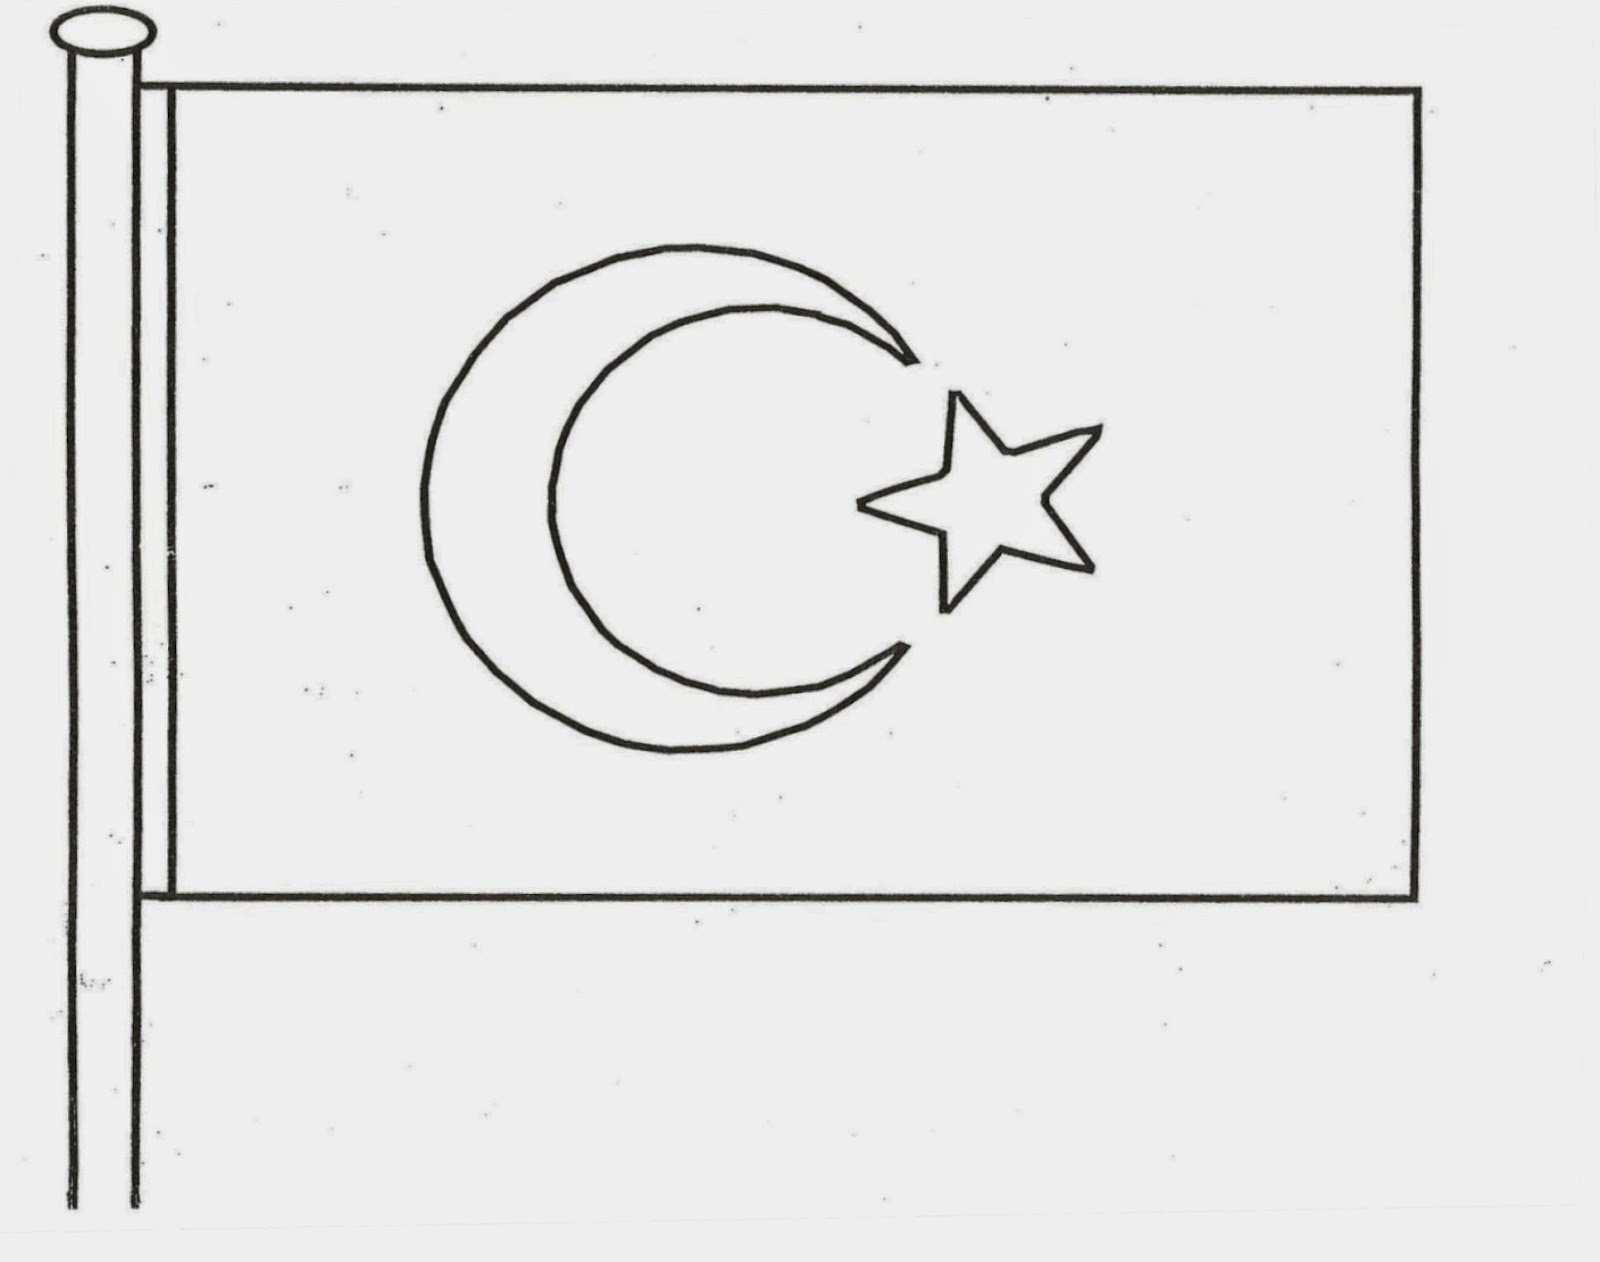 Turk Bayragi Cicicee